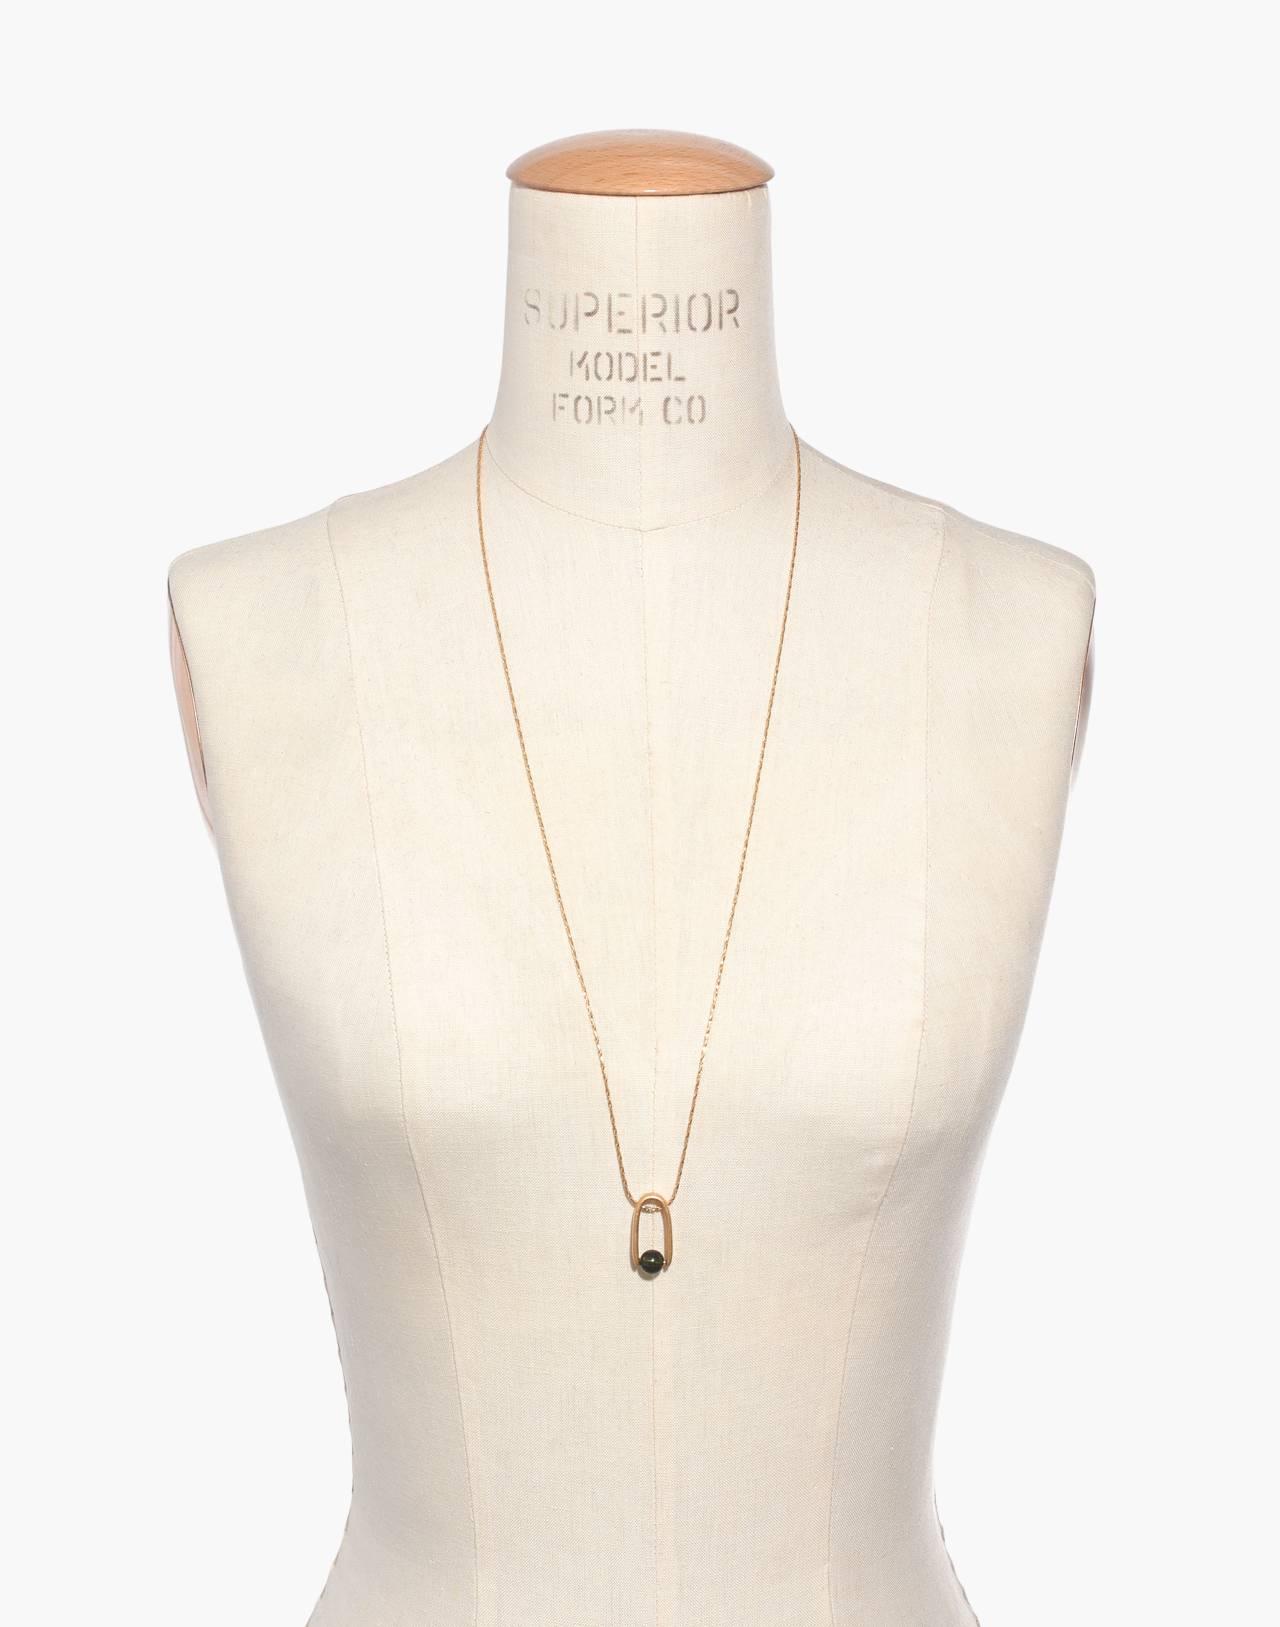 Resin Pinball Pendant Necklace in grandpa image 3